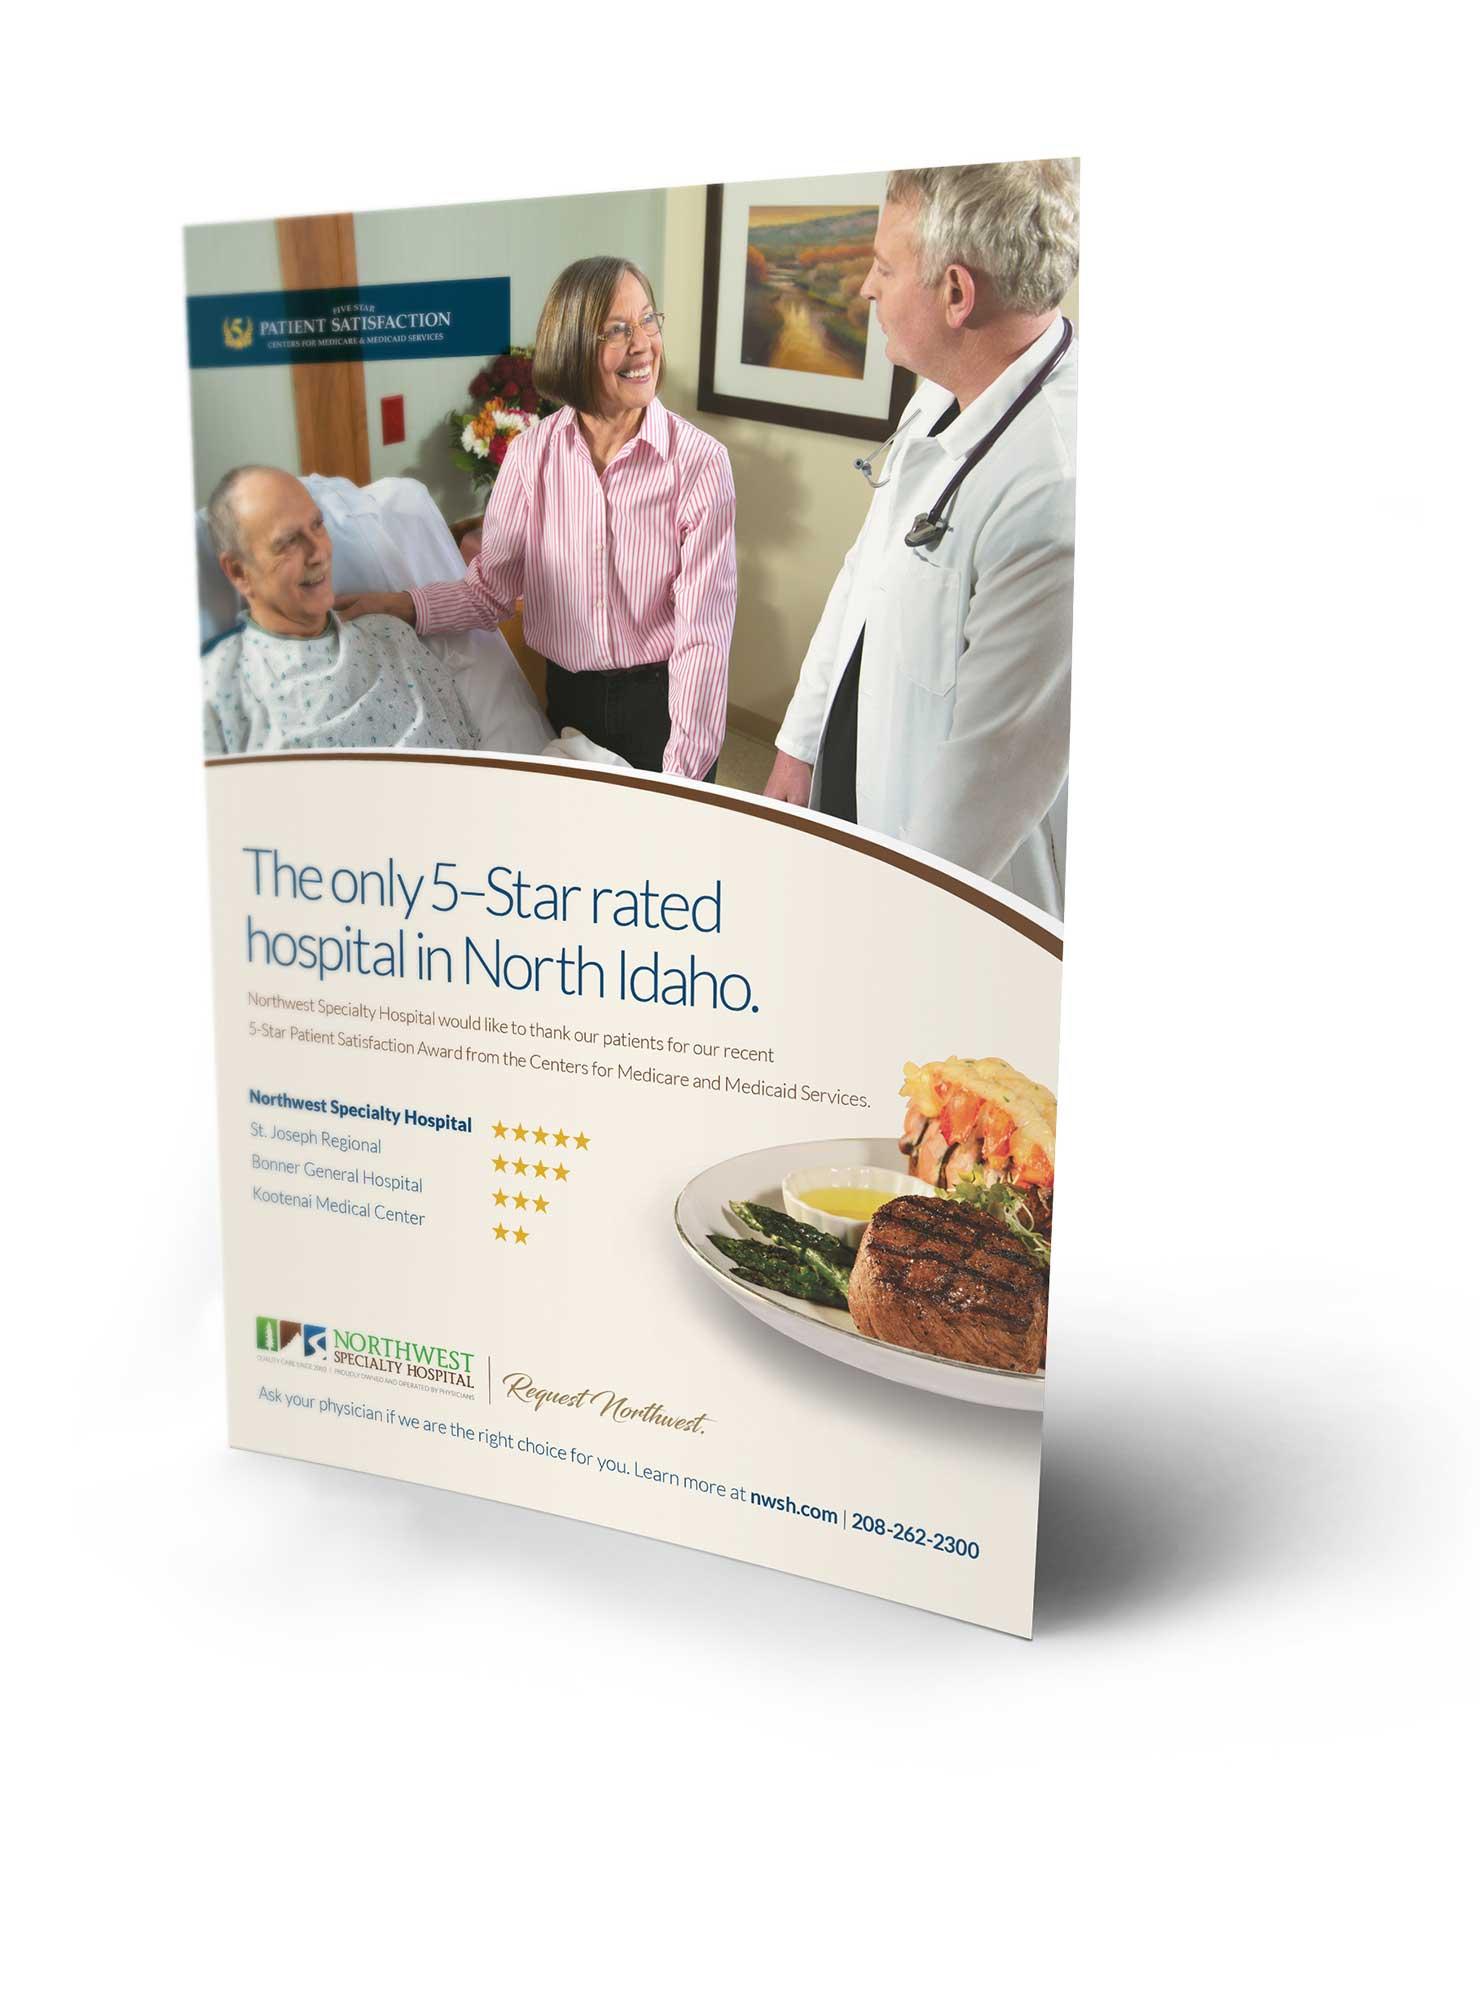 Northwest Specialty Hospital Web Design and Development